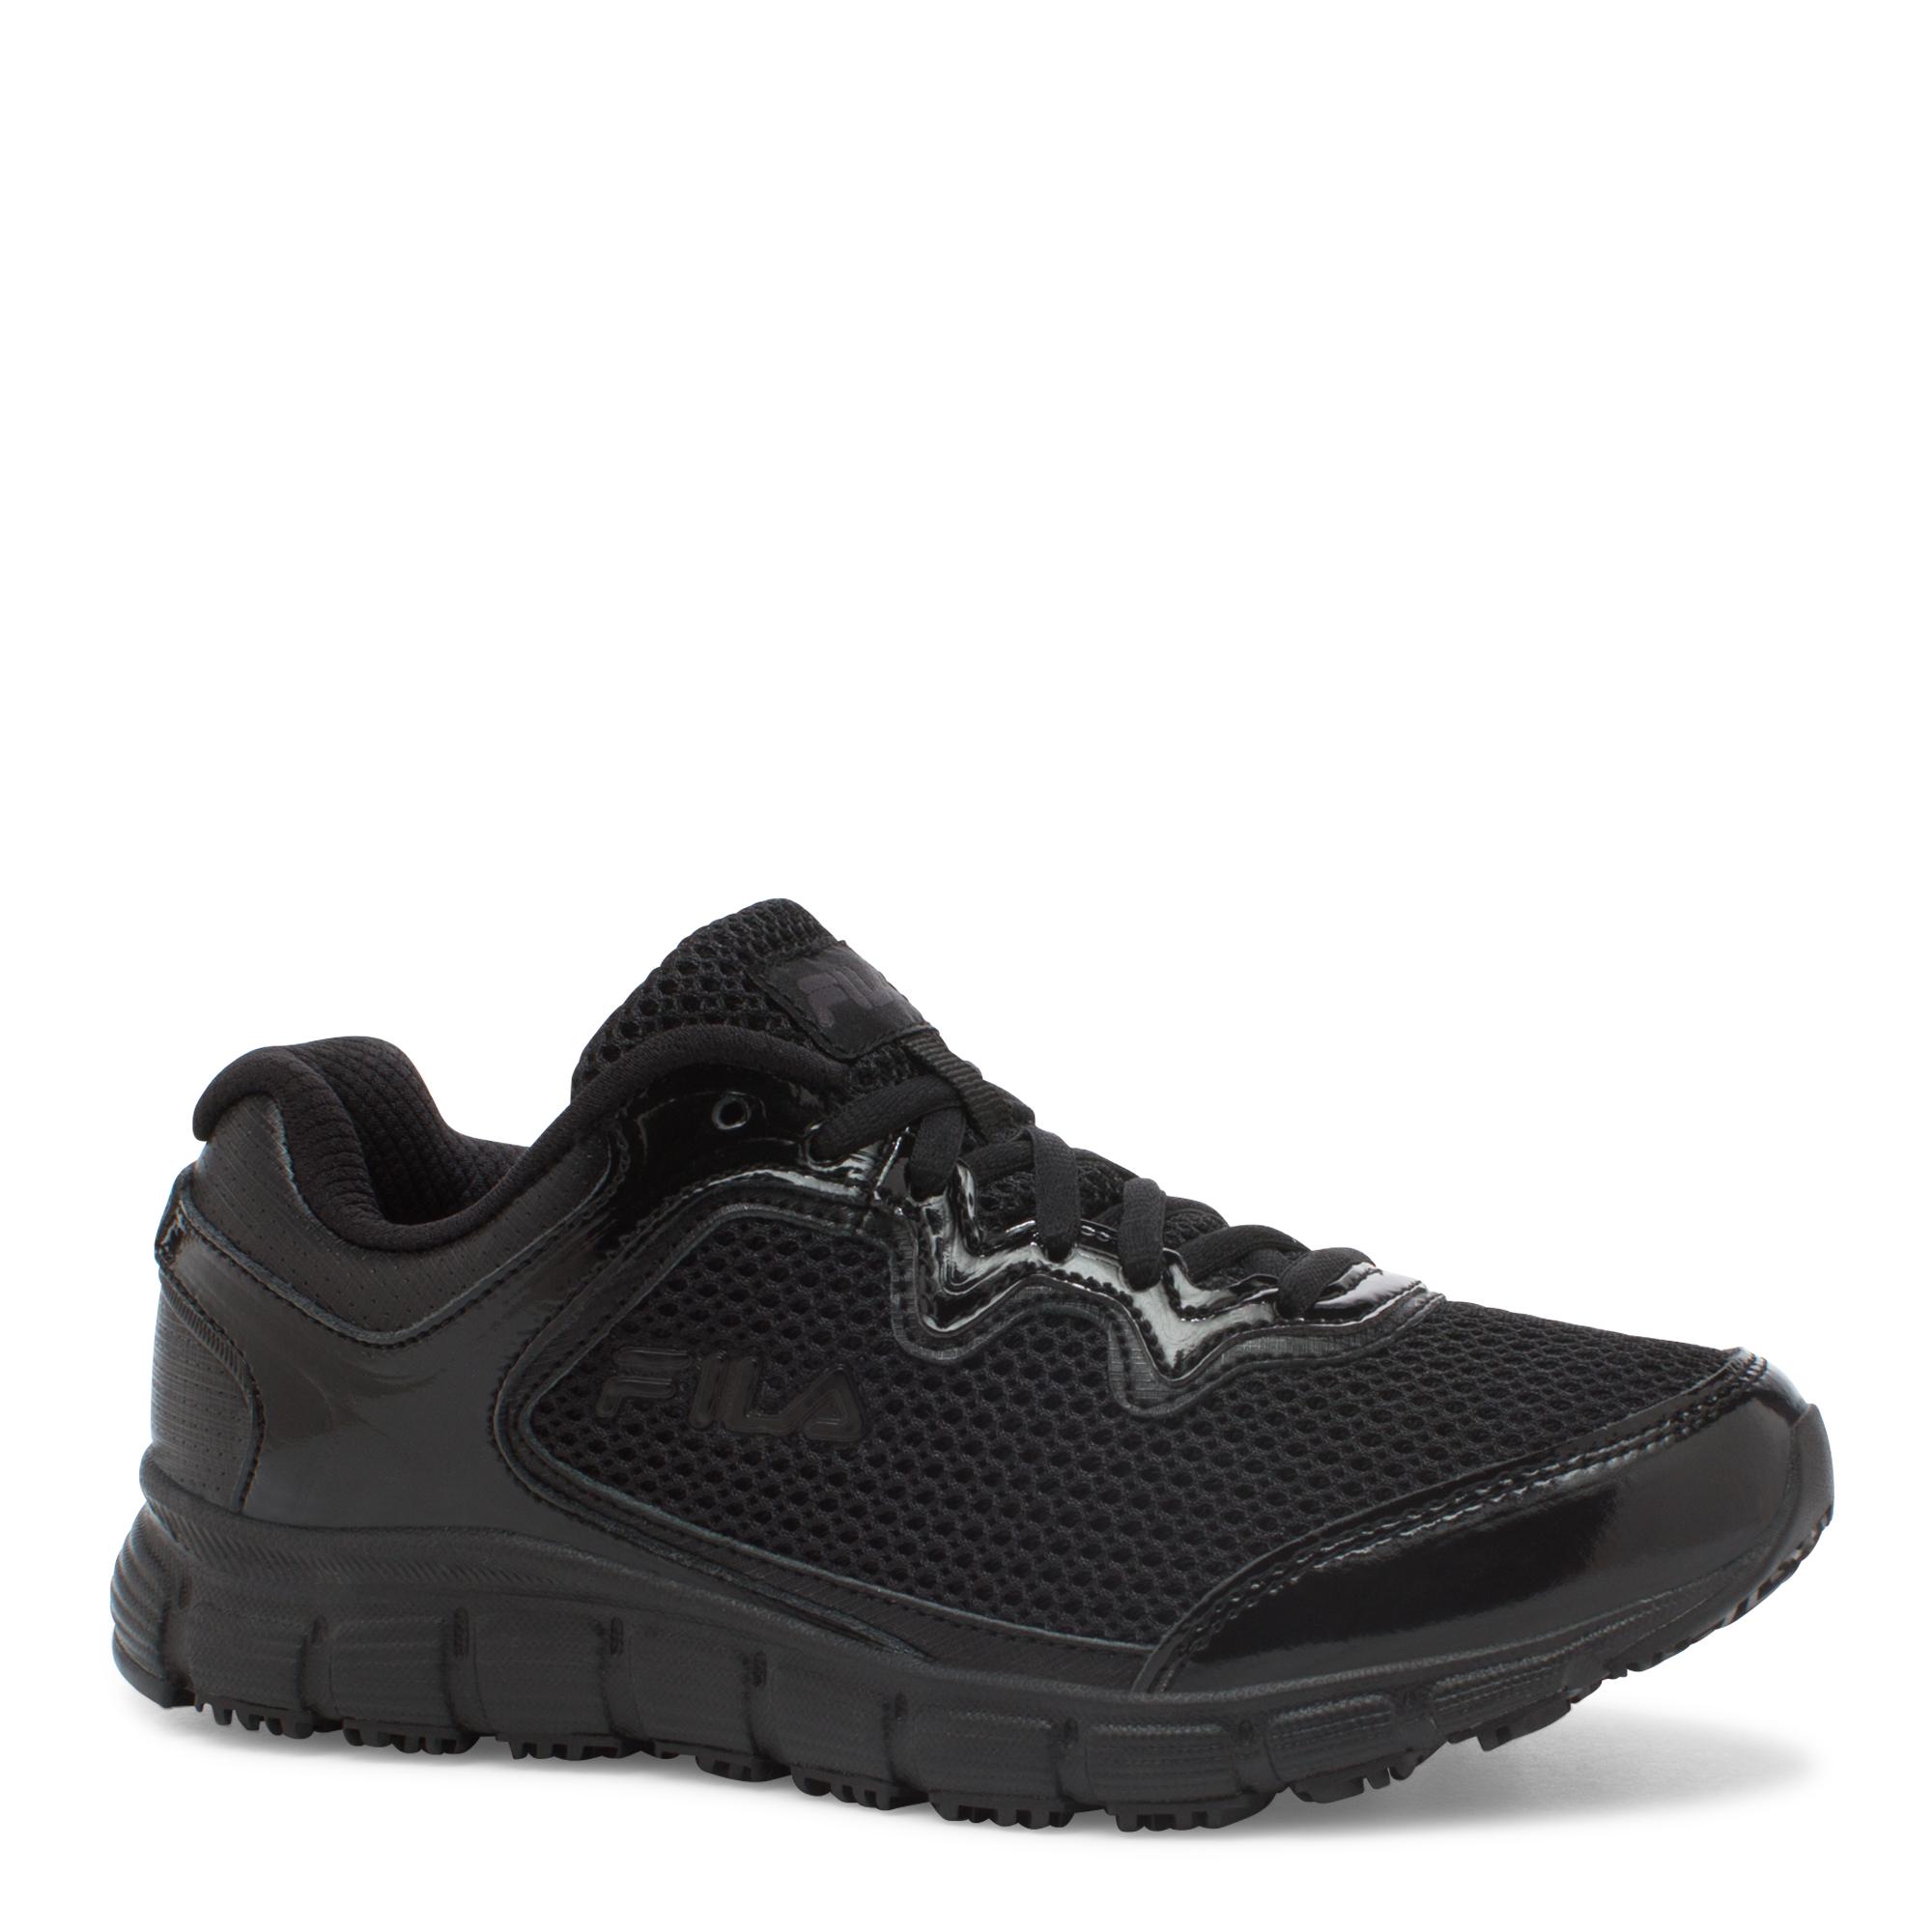 0681ec8de961 Women s Memory Fresh Start Slip Resistant Work Shoe.  39.99. About Us